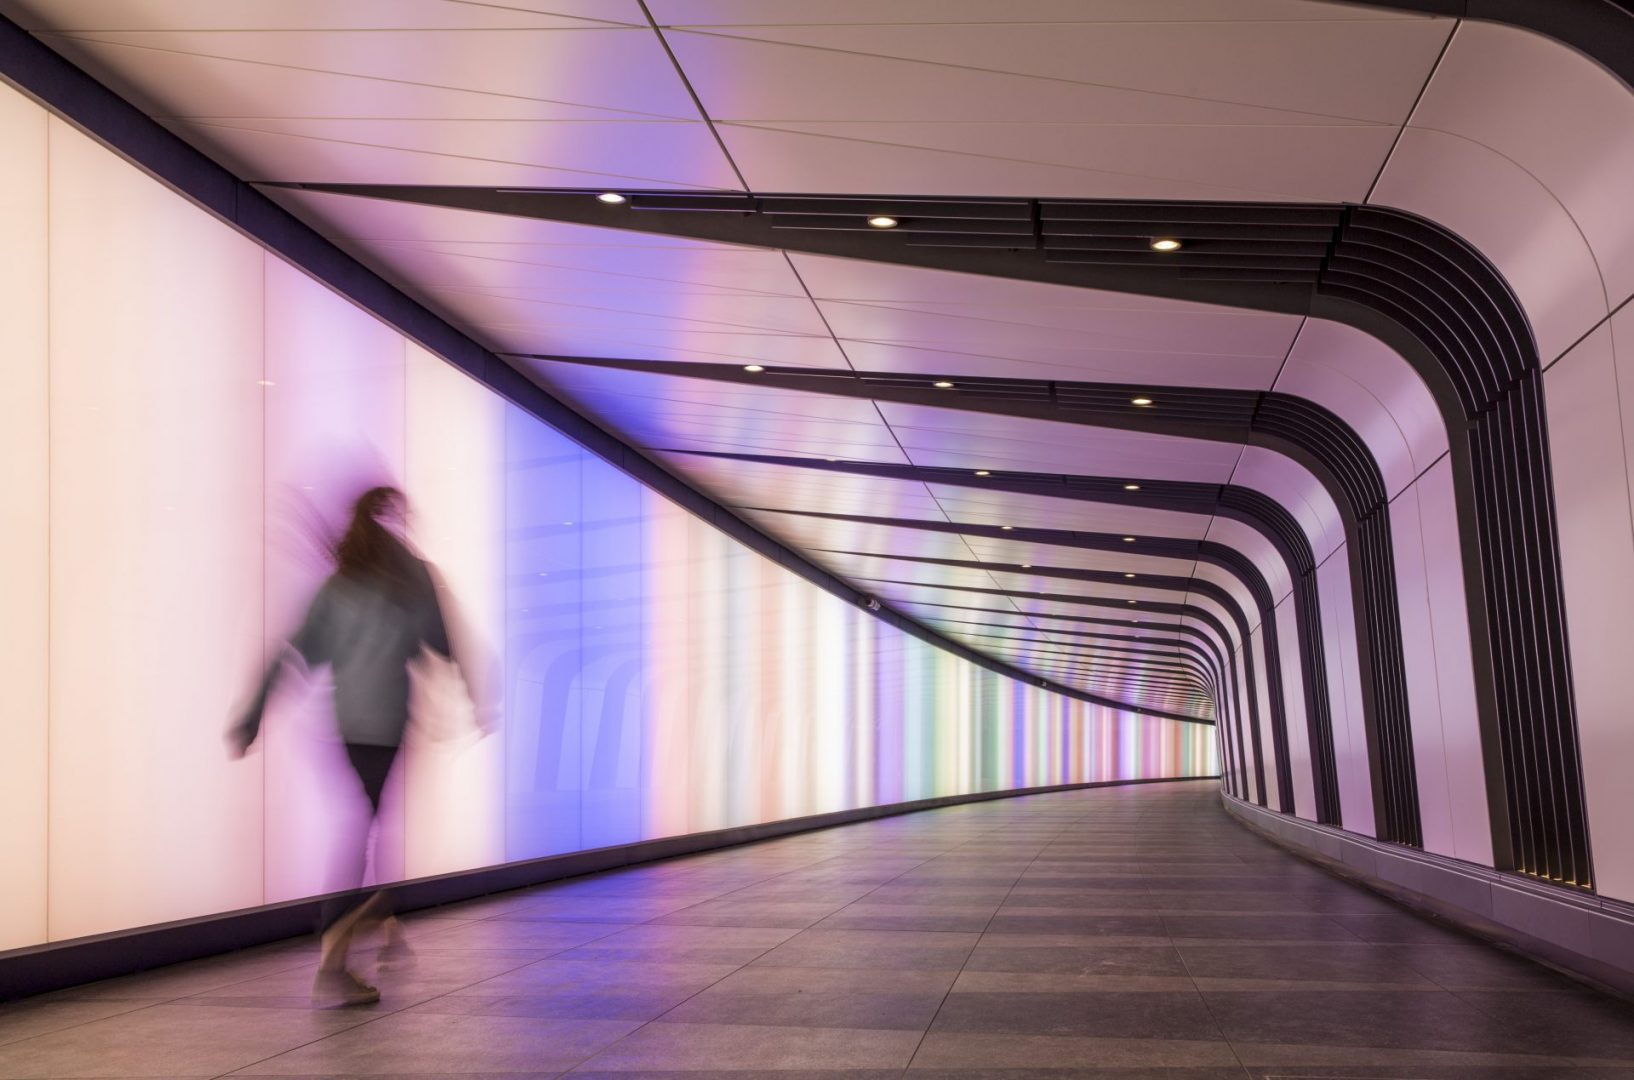 Kings Cross Tunnel Light Wall | public realm lighting | The Light Lab